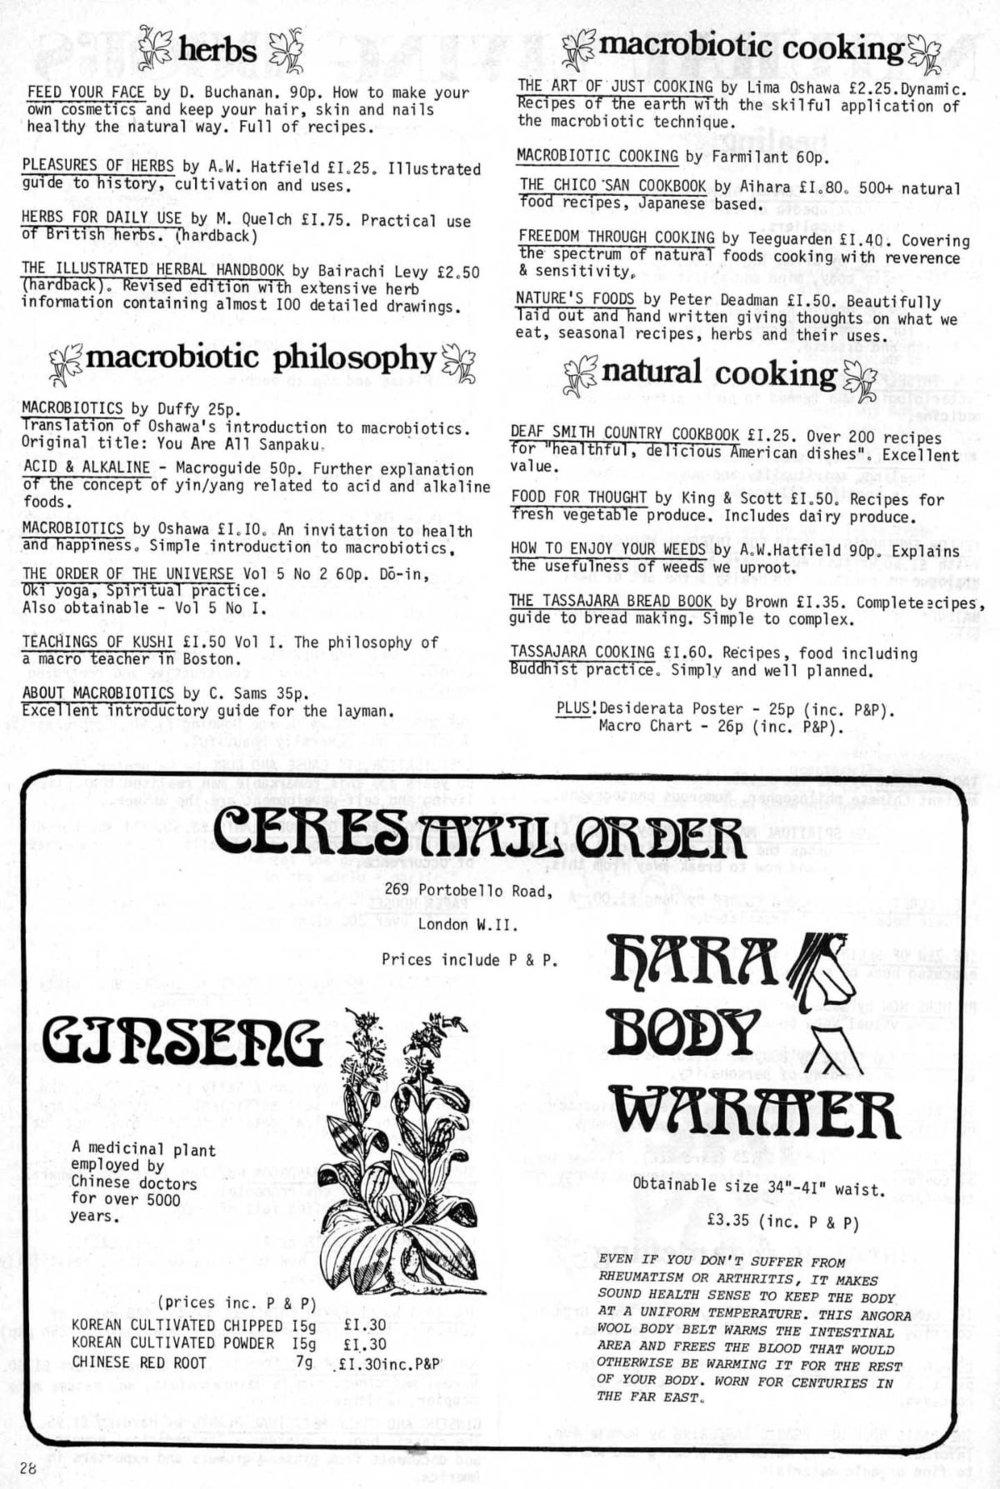 seed-v4-n1-jan1975-28.jpg